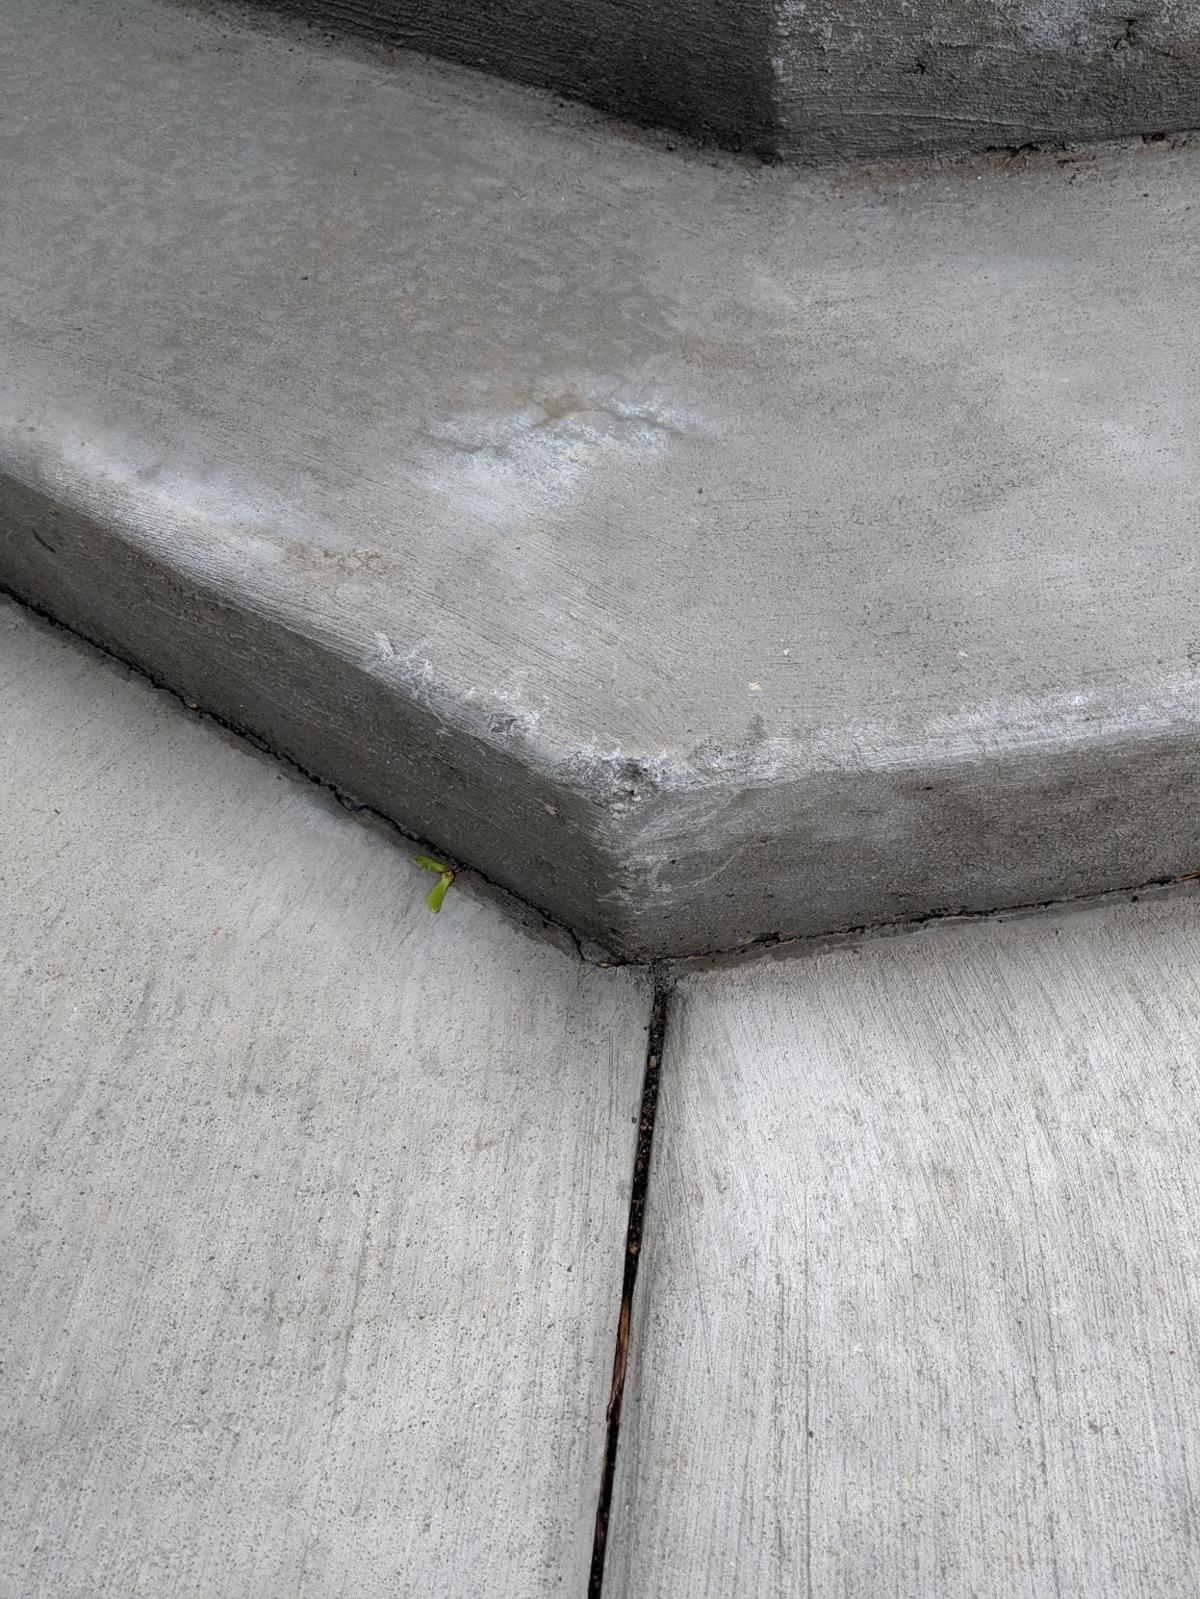 Concrete chipped